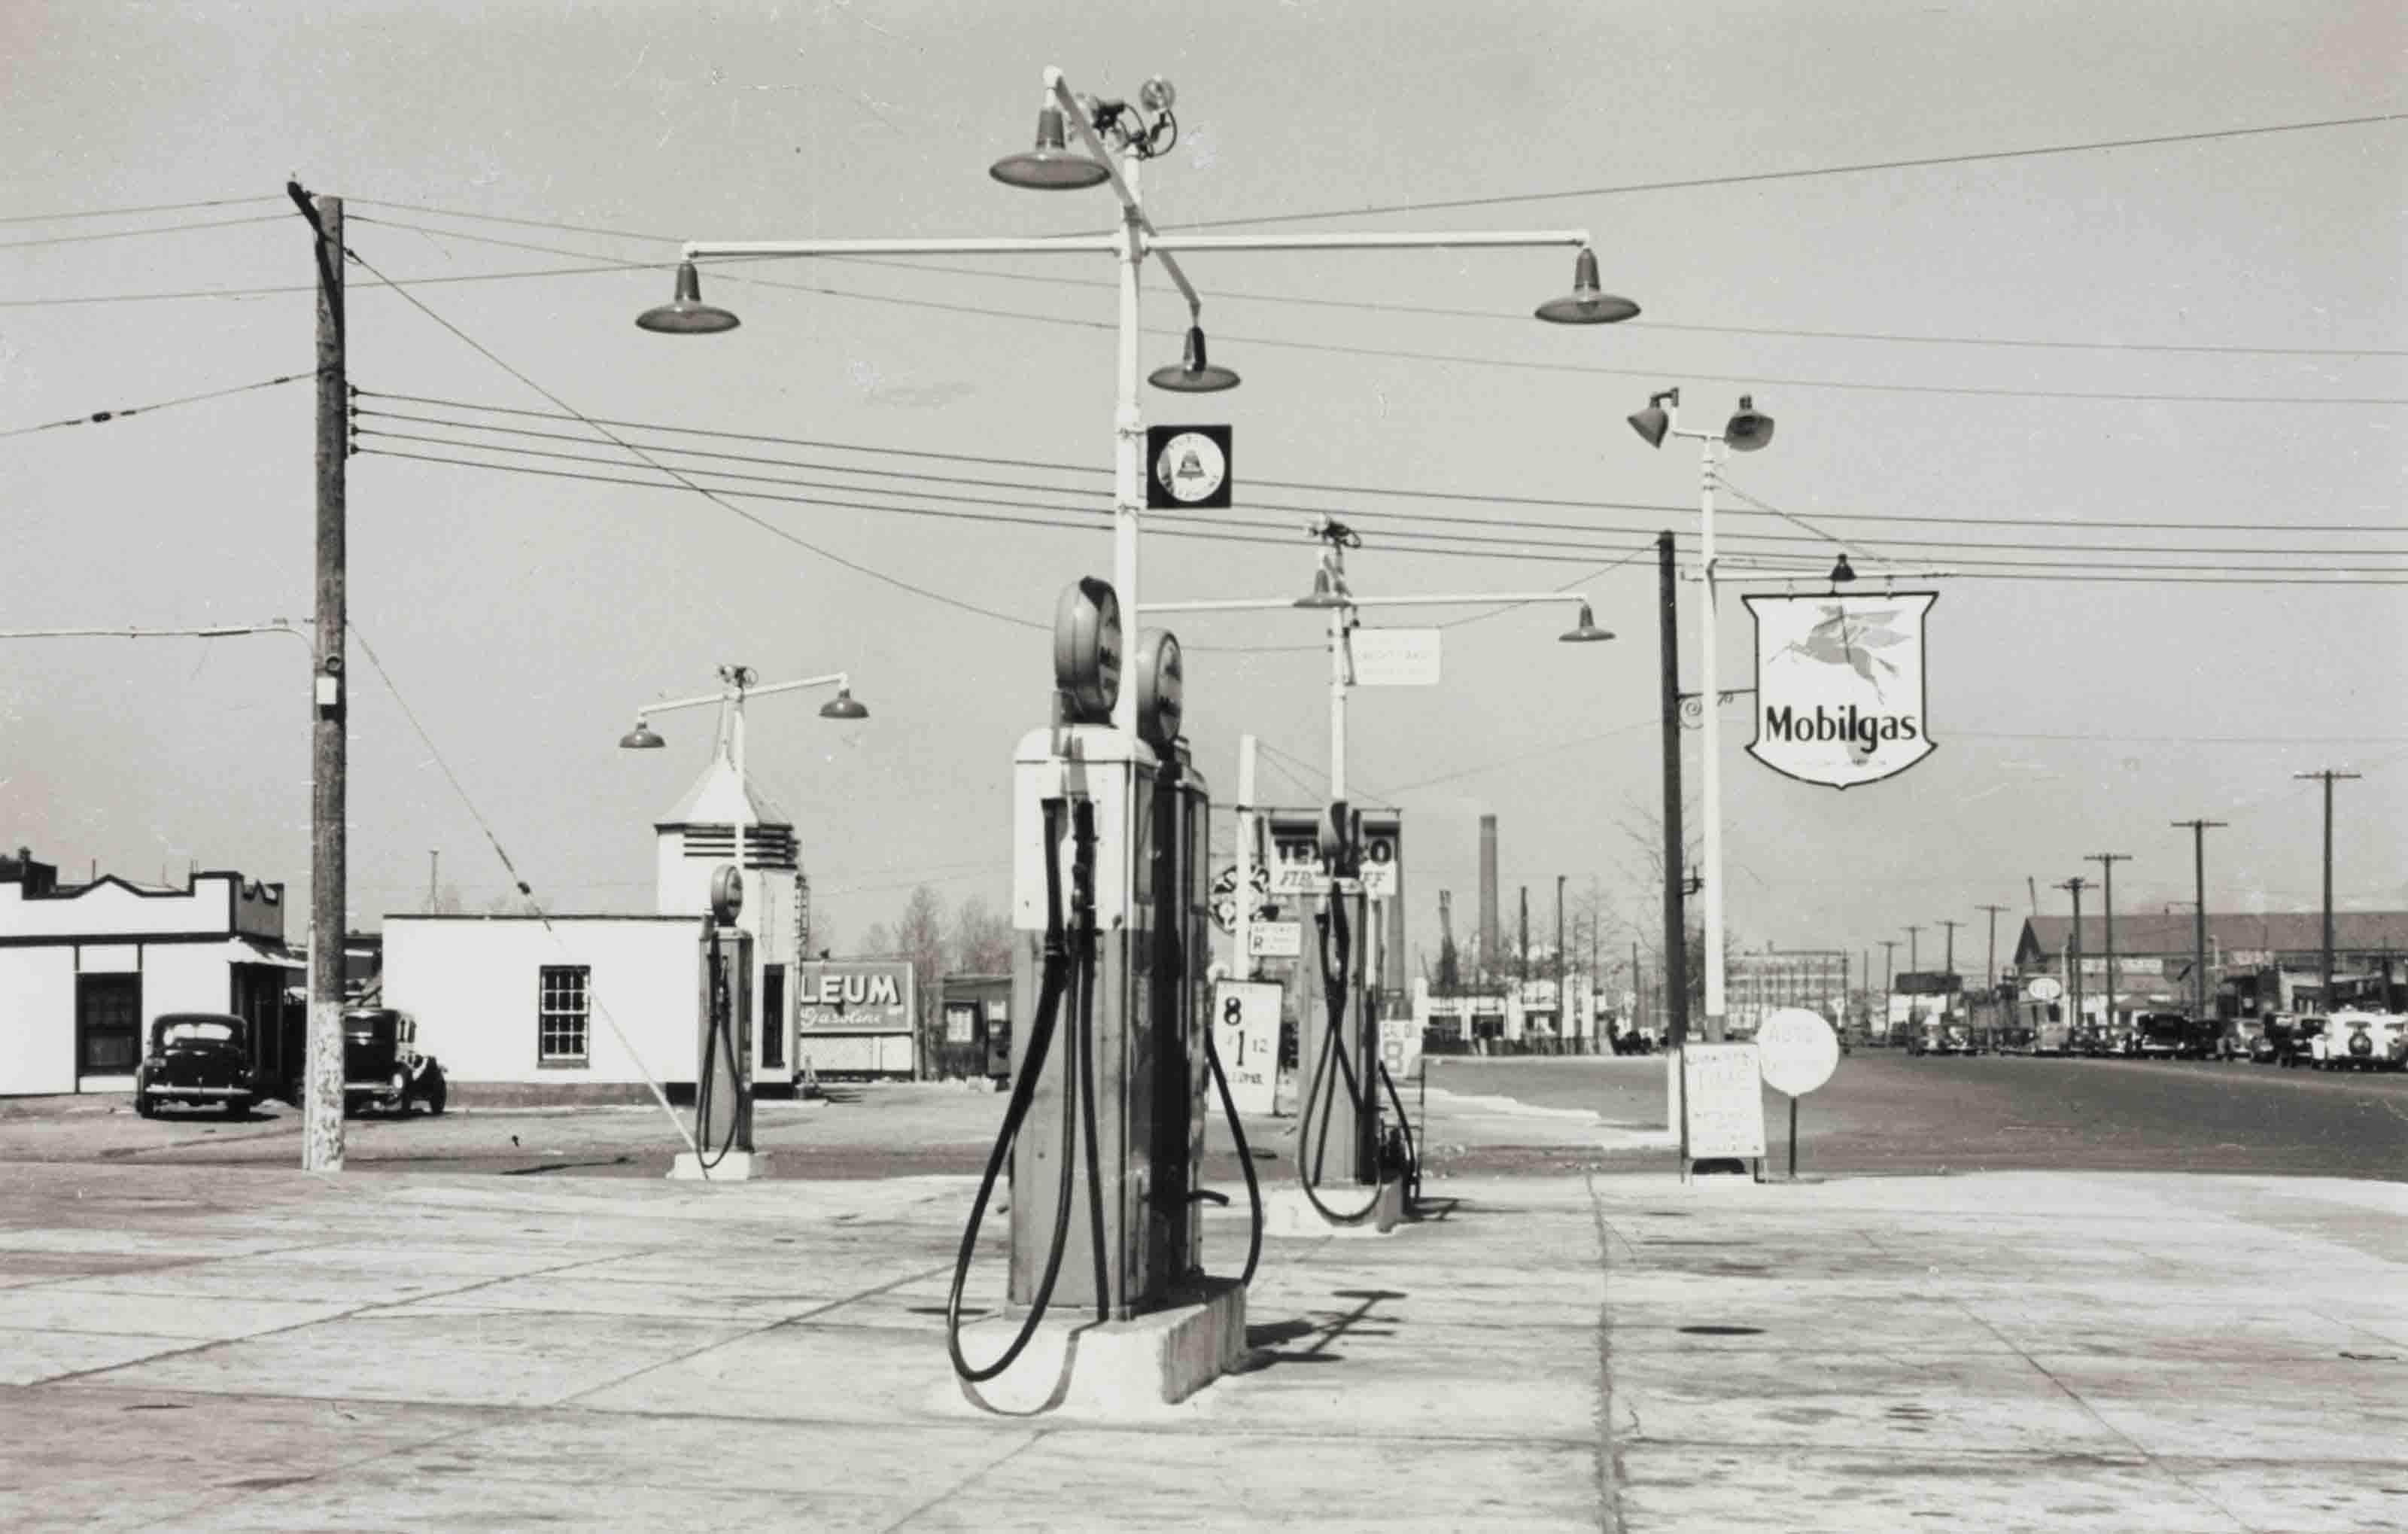 Mobilgas, Astoria, Queens, 1940